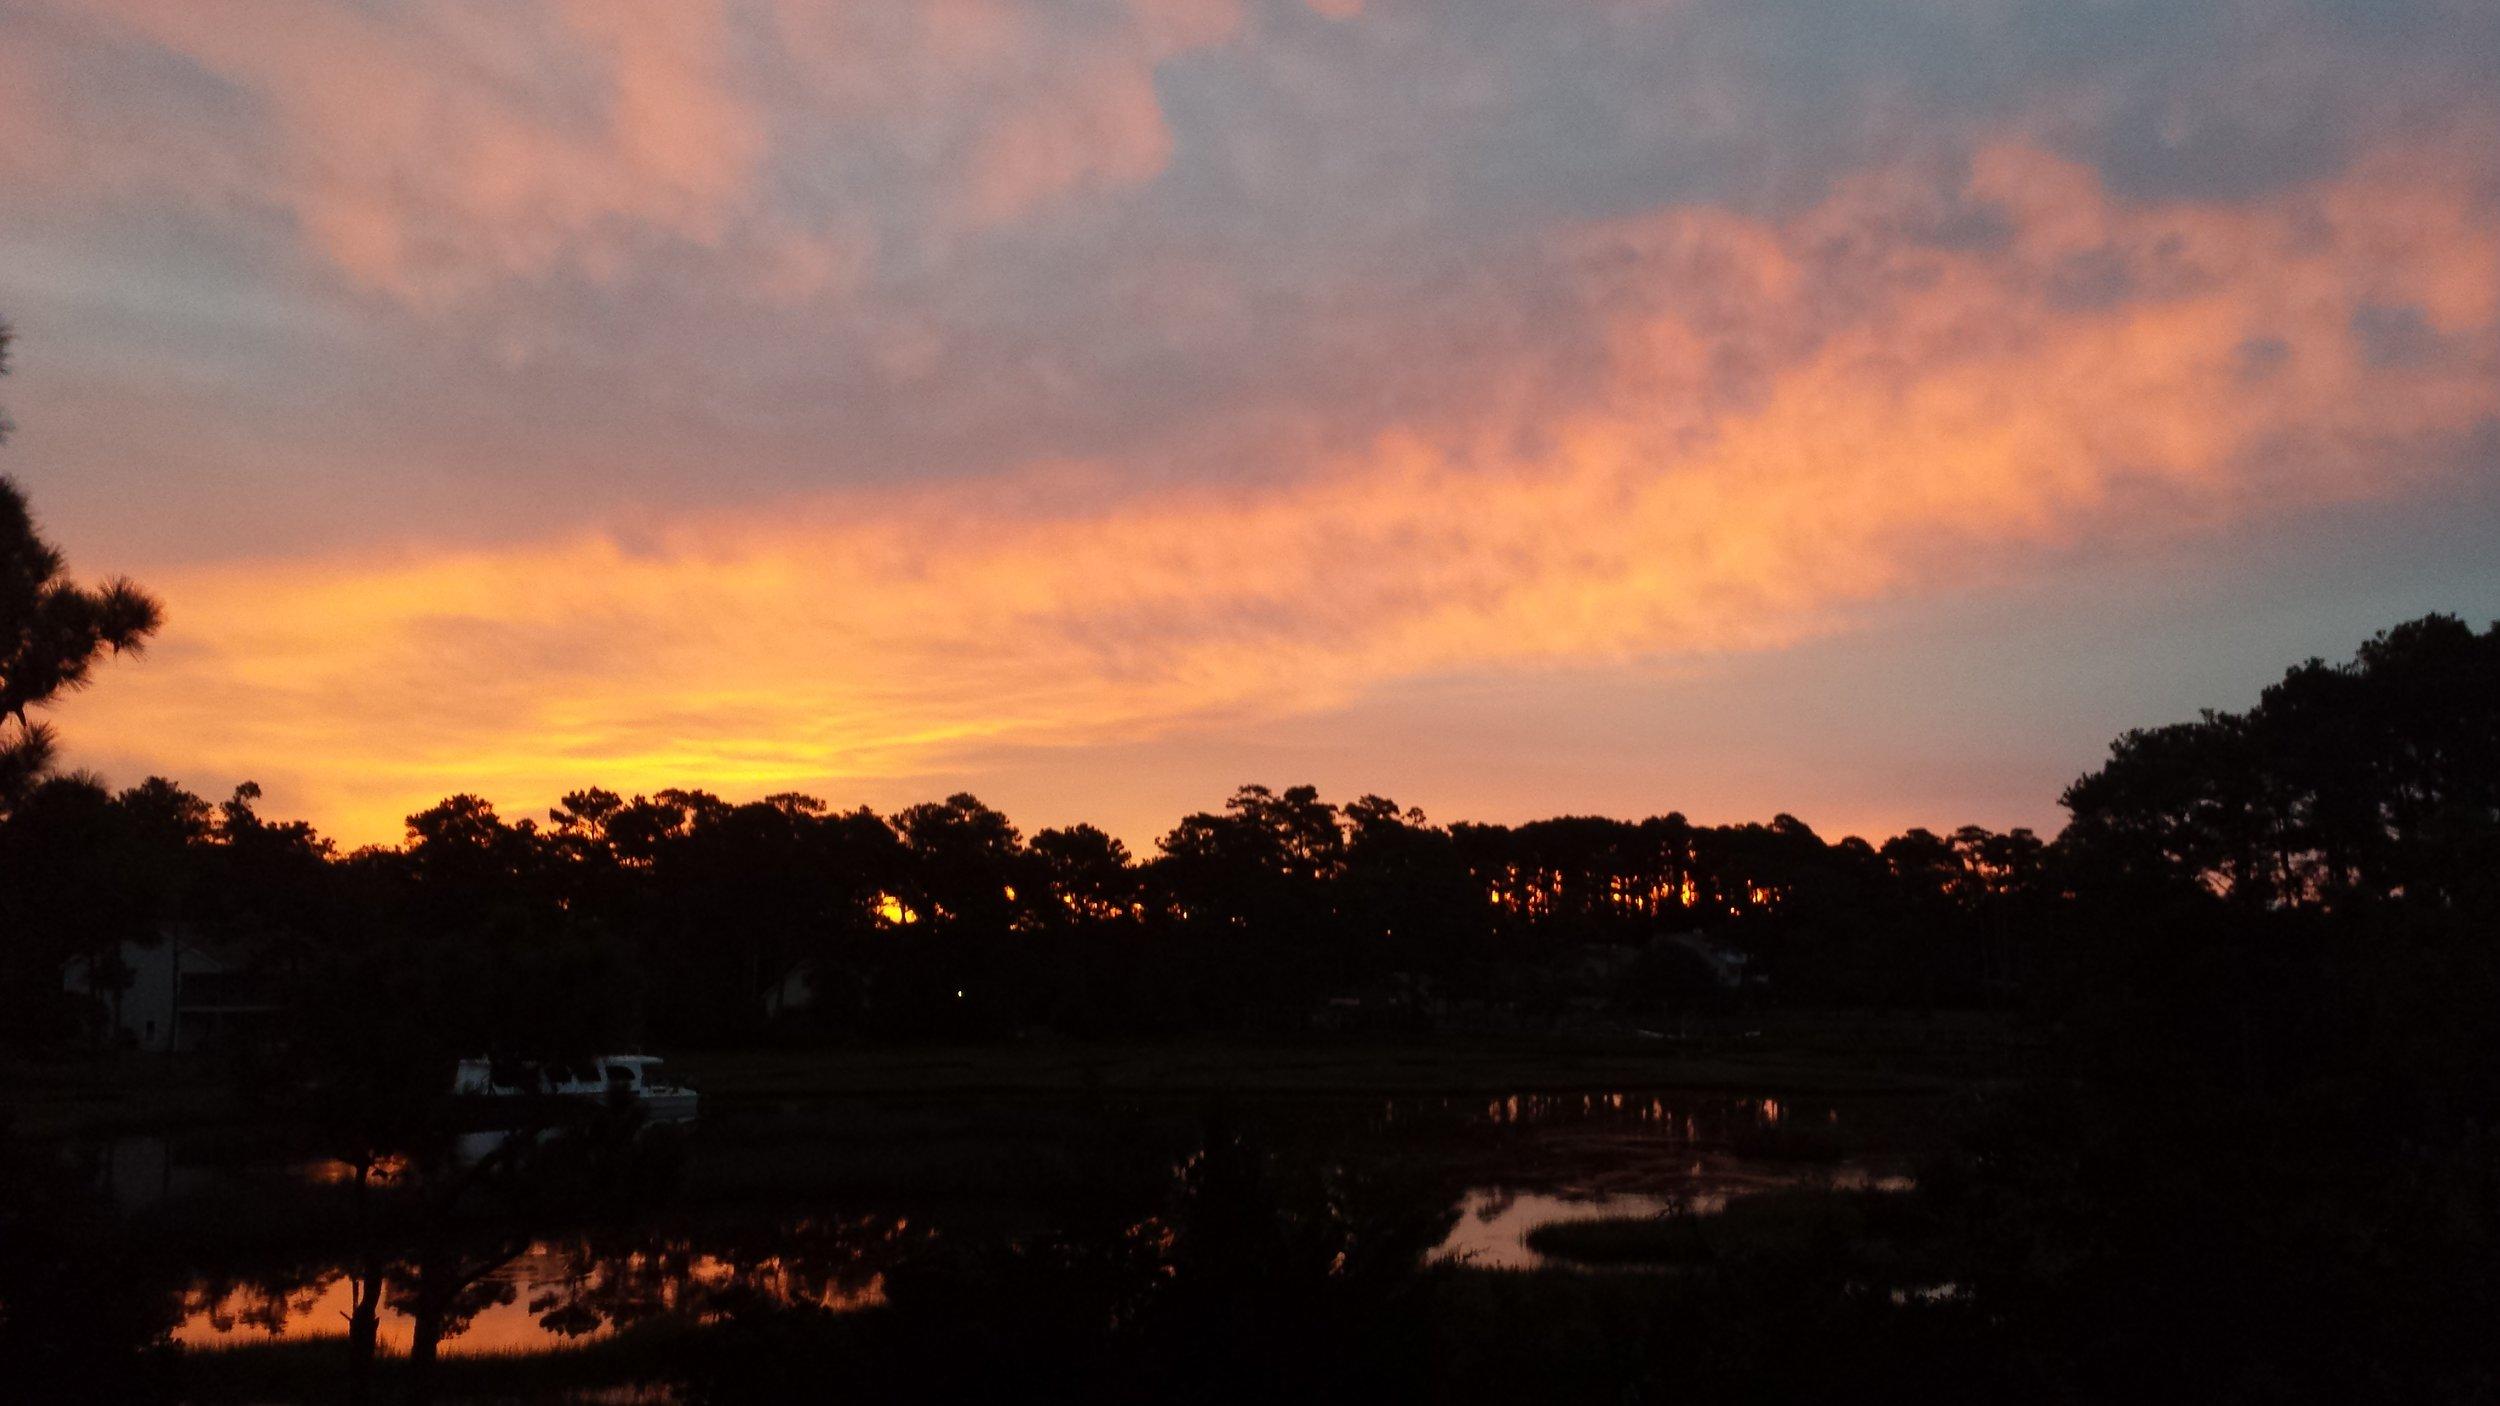 Sunrise view over the marsh in Gloucester